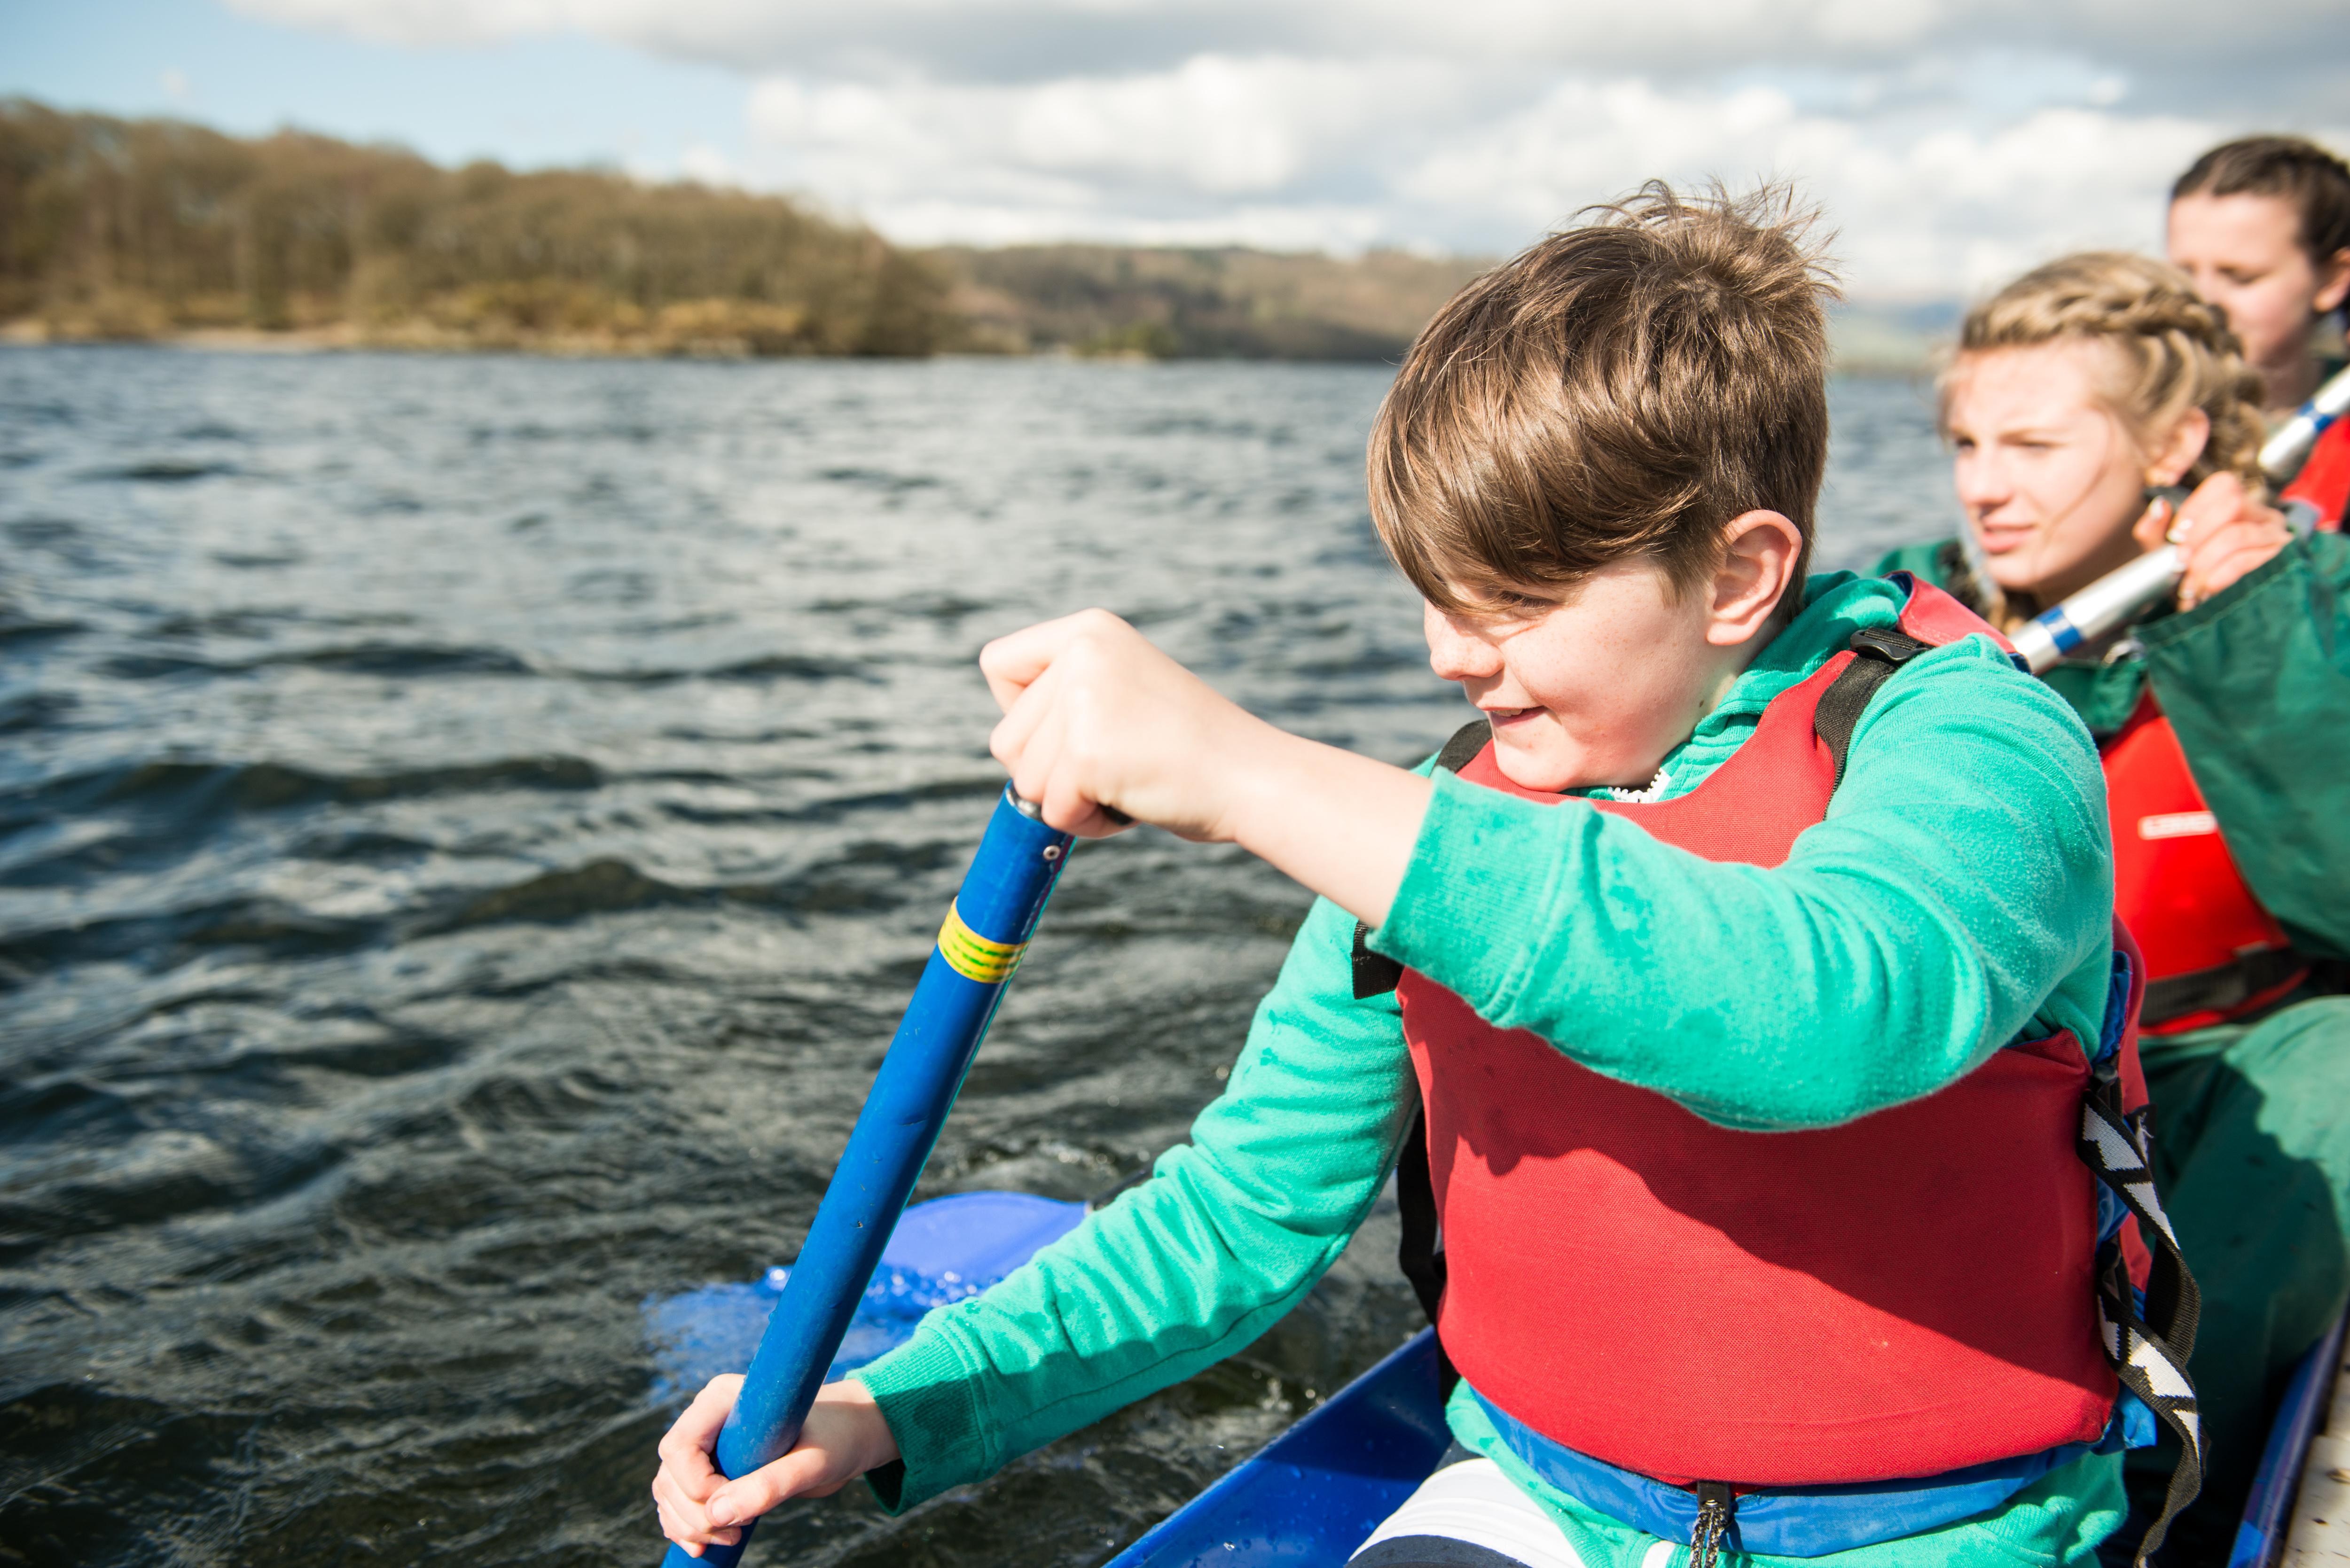 scouts-canoeing-jpg